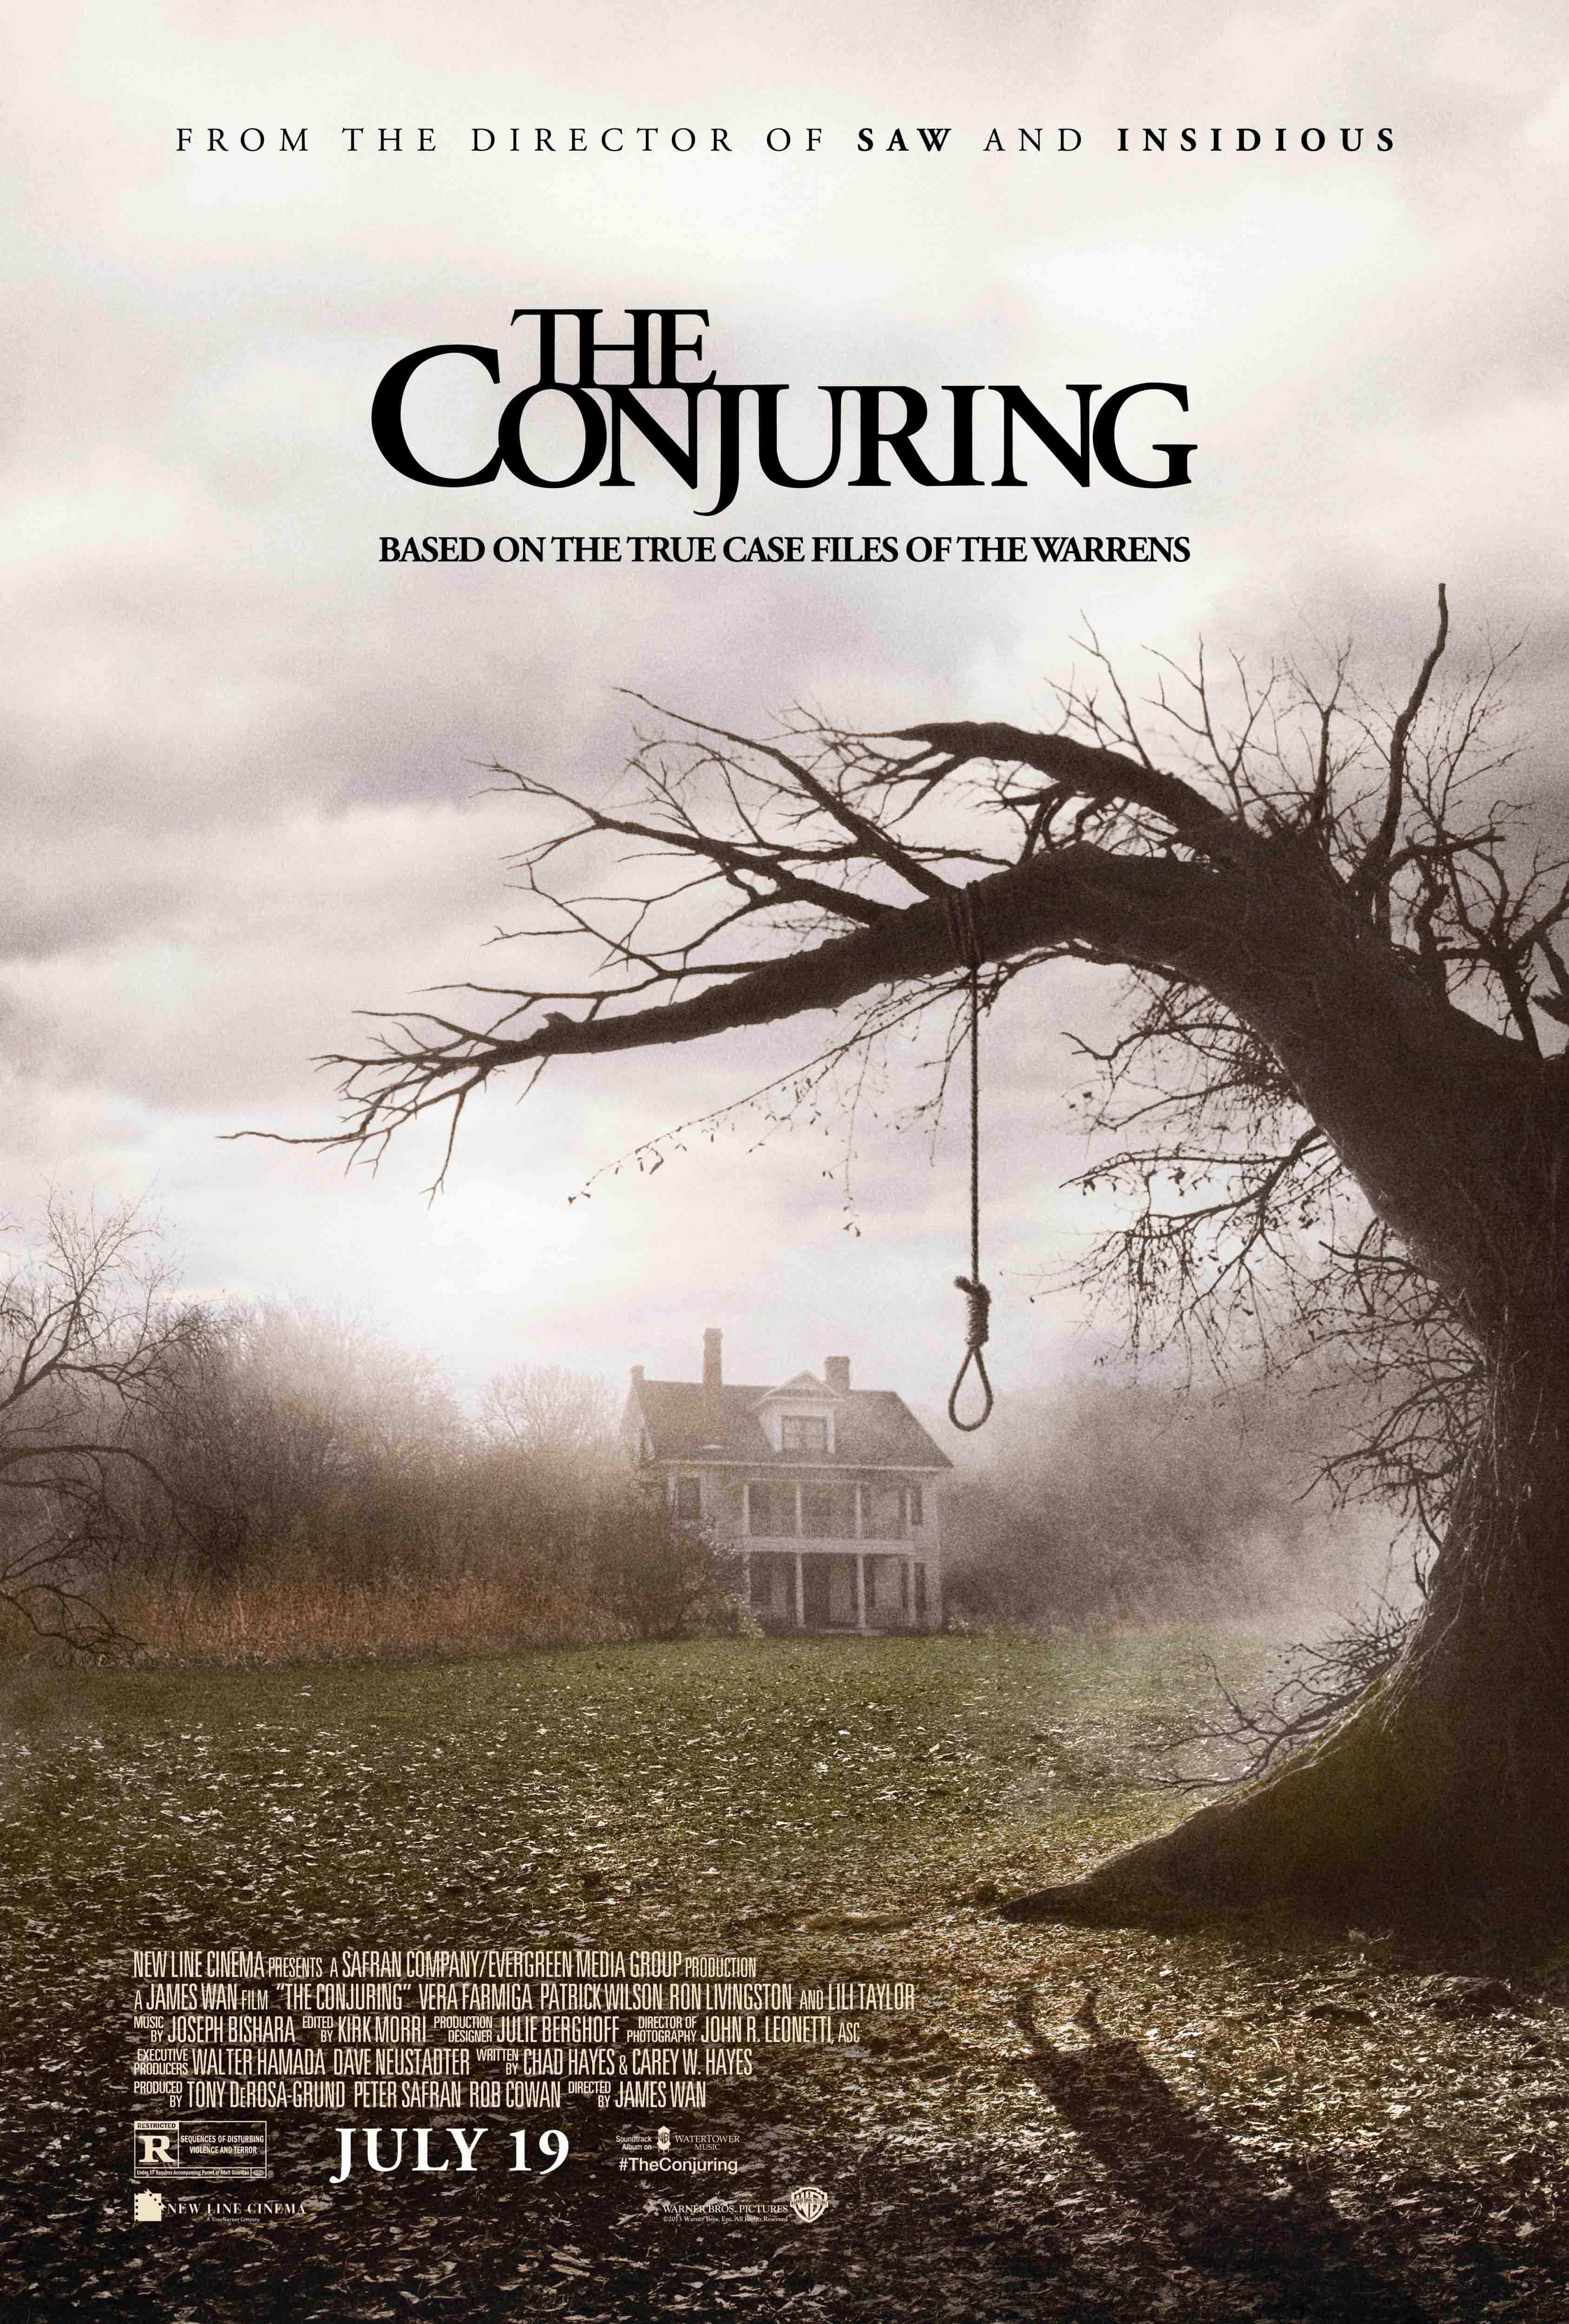 M2013040CIM 招魂 The Conjuring (2013).jpg